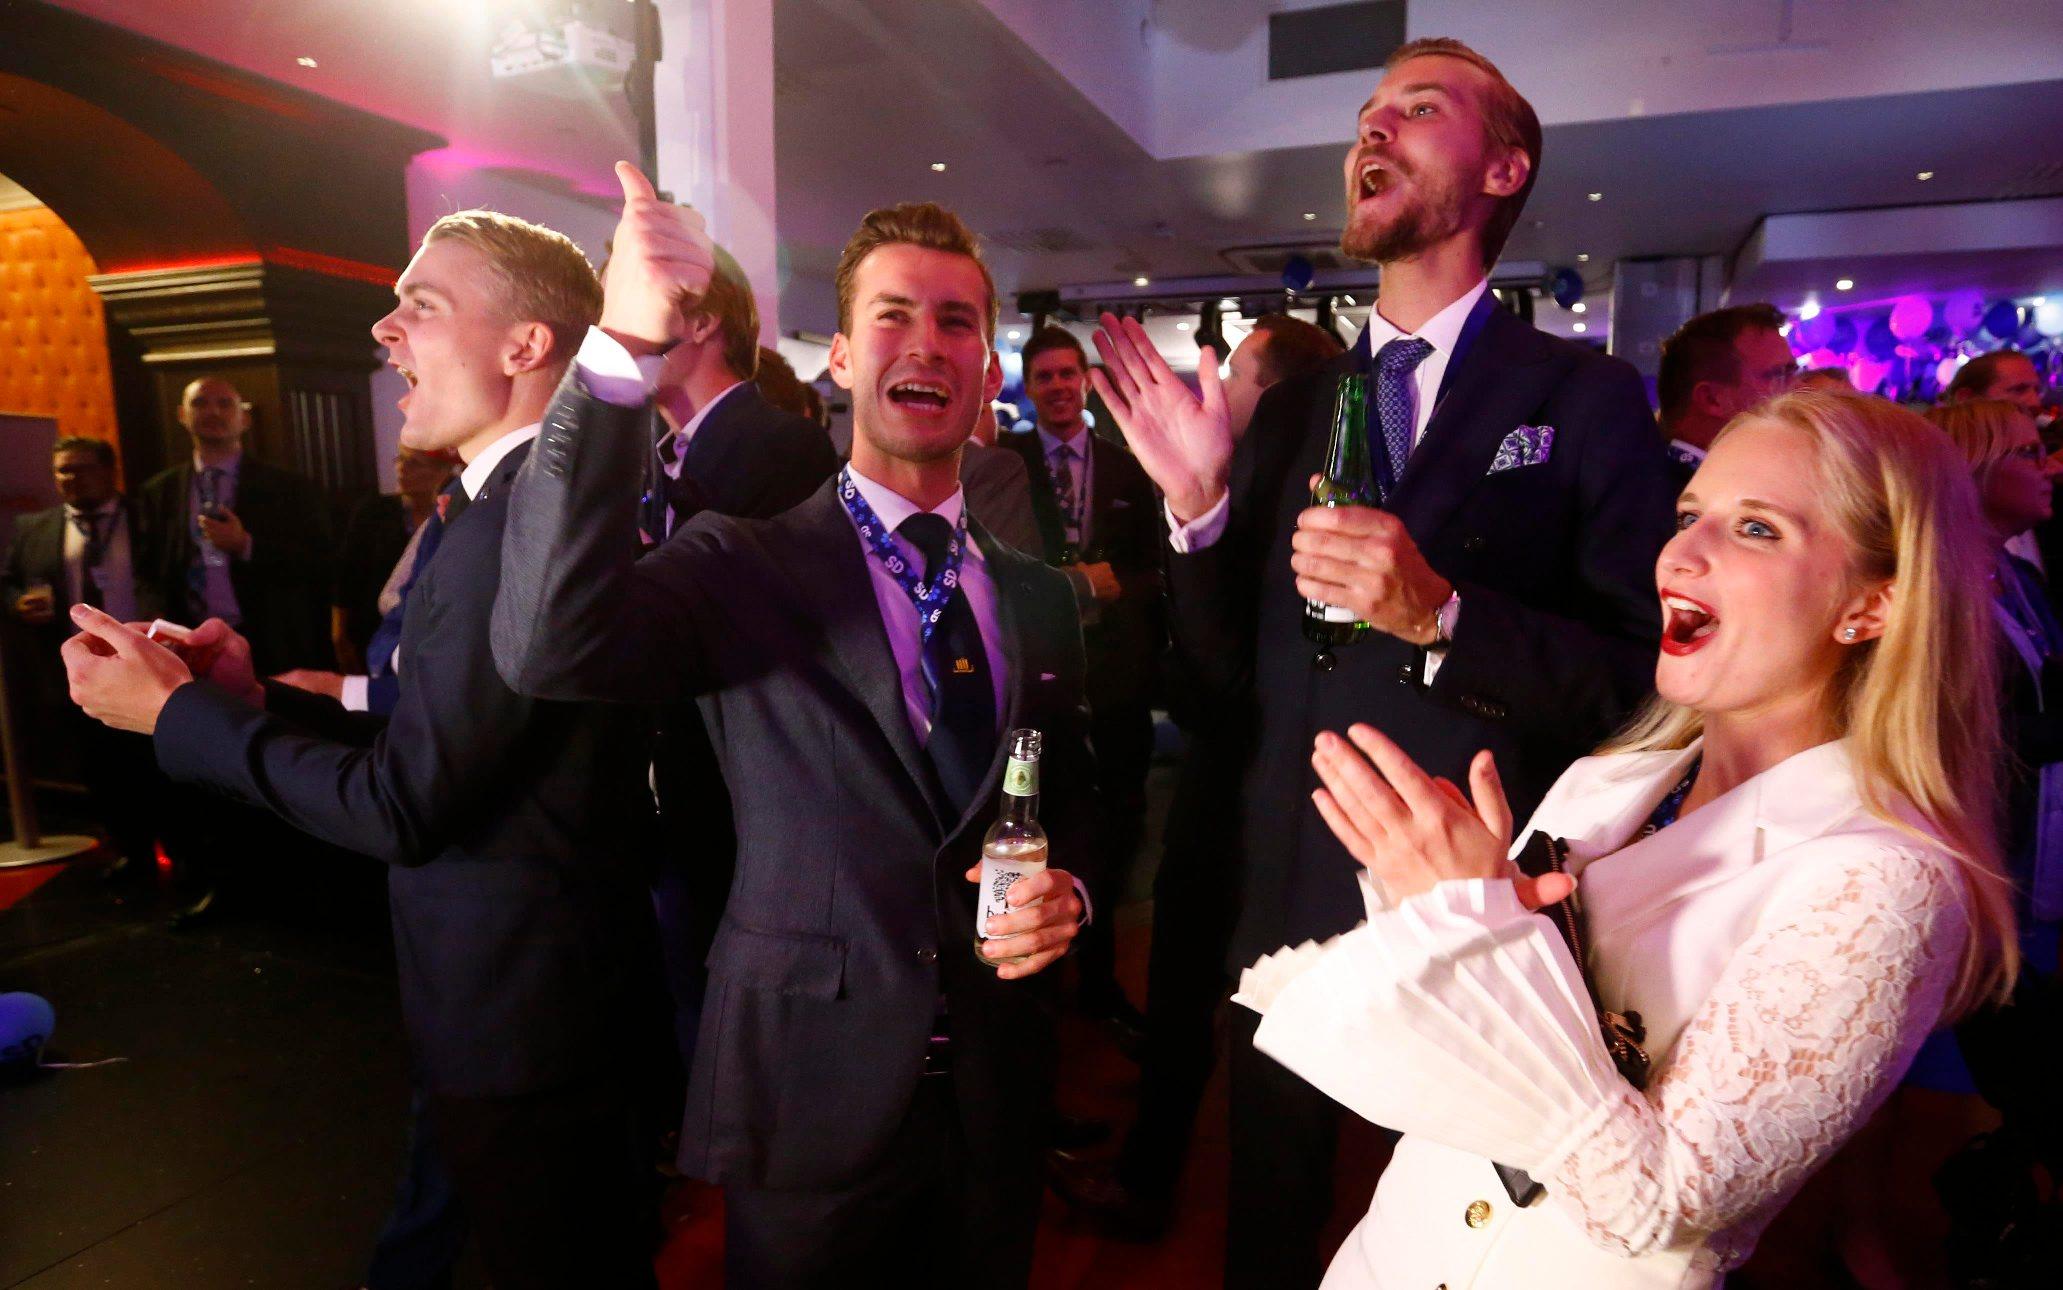 Članovi Švedskih demokrata slave nakon prvih rezultata izbora